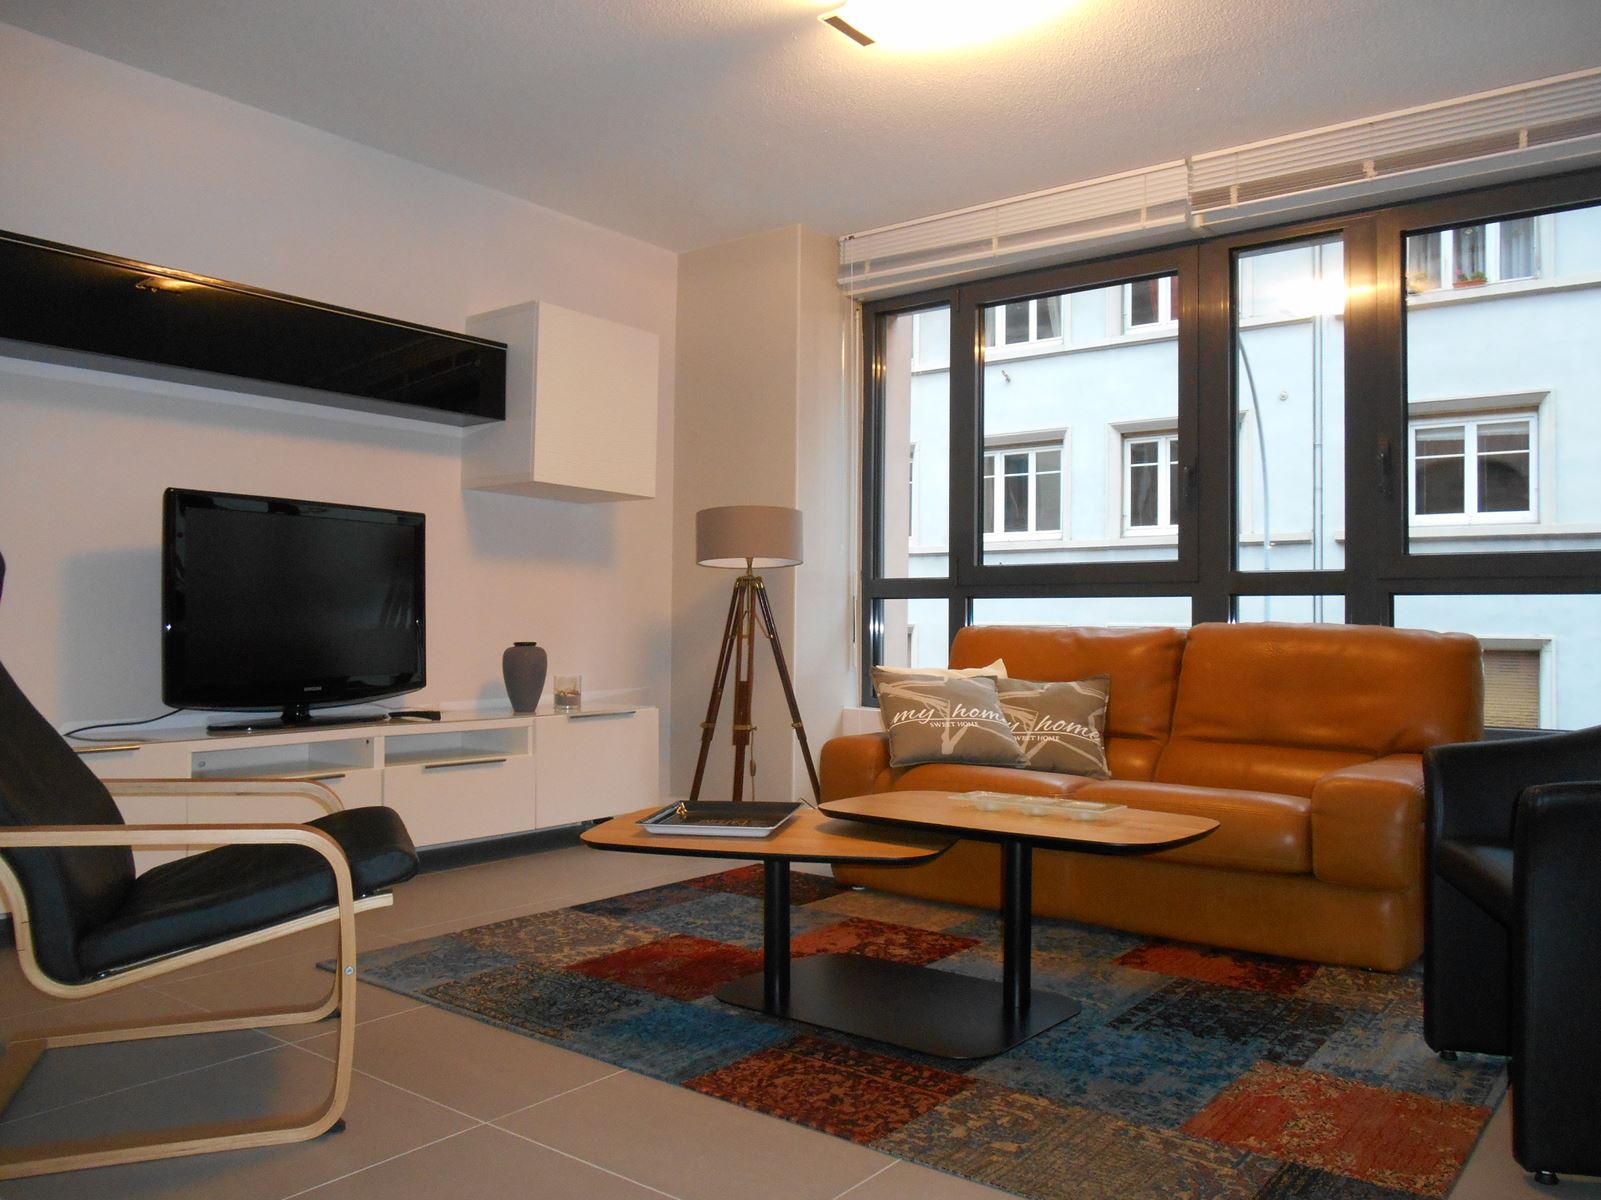 [Jazzy] Spacieux 2 pièces meublé - Gare / rue Kageneck - nos locations - Beausite Immobilier 1